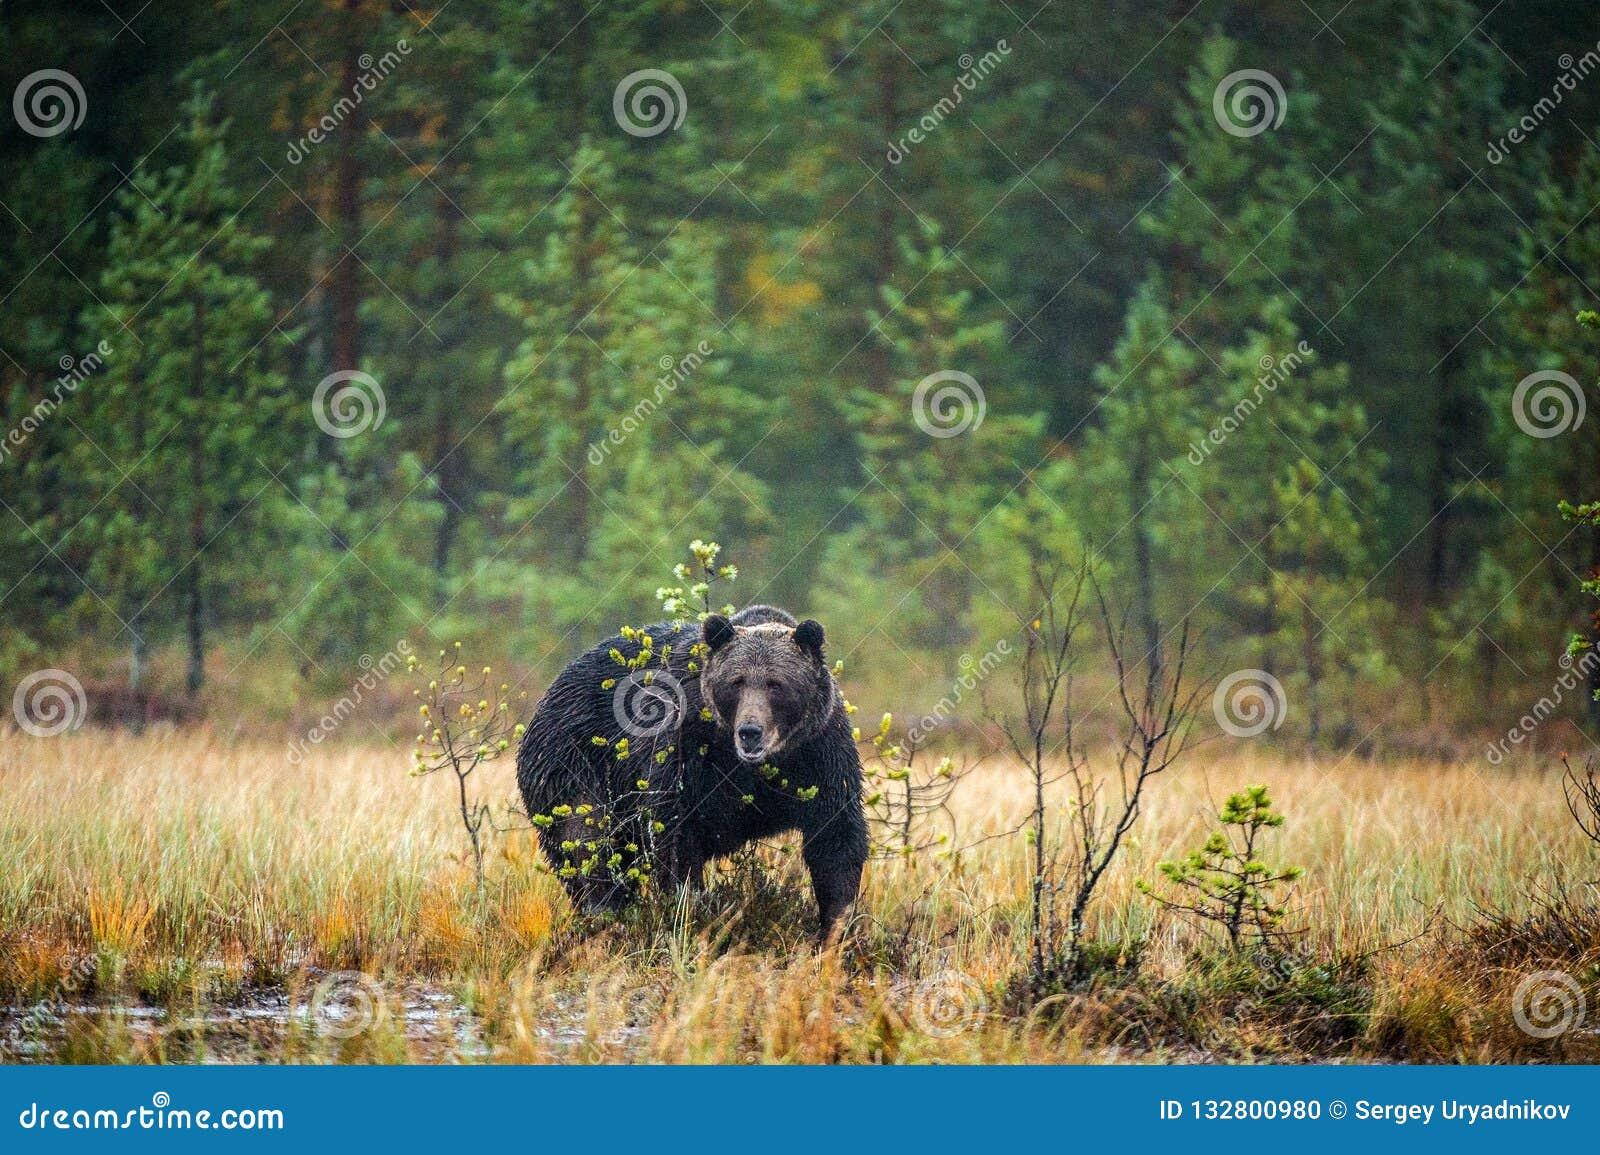 A brown bear in the fog on the bog. Adult Big Brown Bear Male. Scientific name: Ursus arctos.